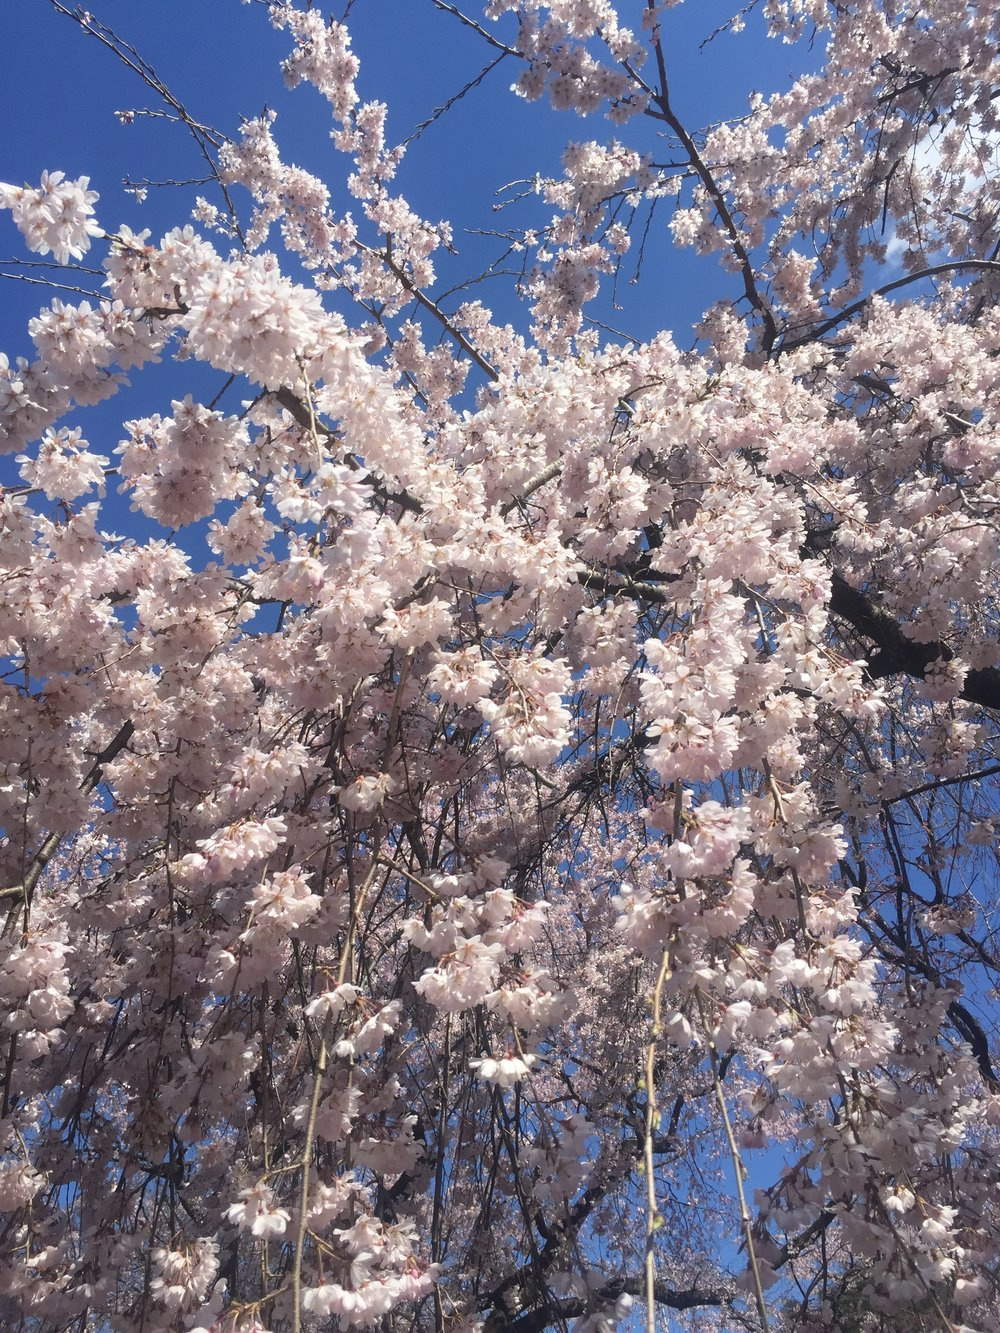 shinjuku cherry blossoms tokyo japan.JPG